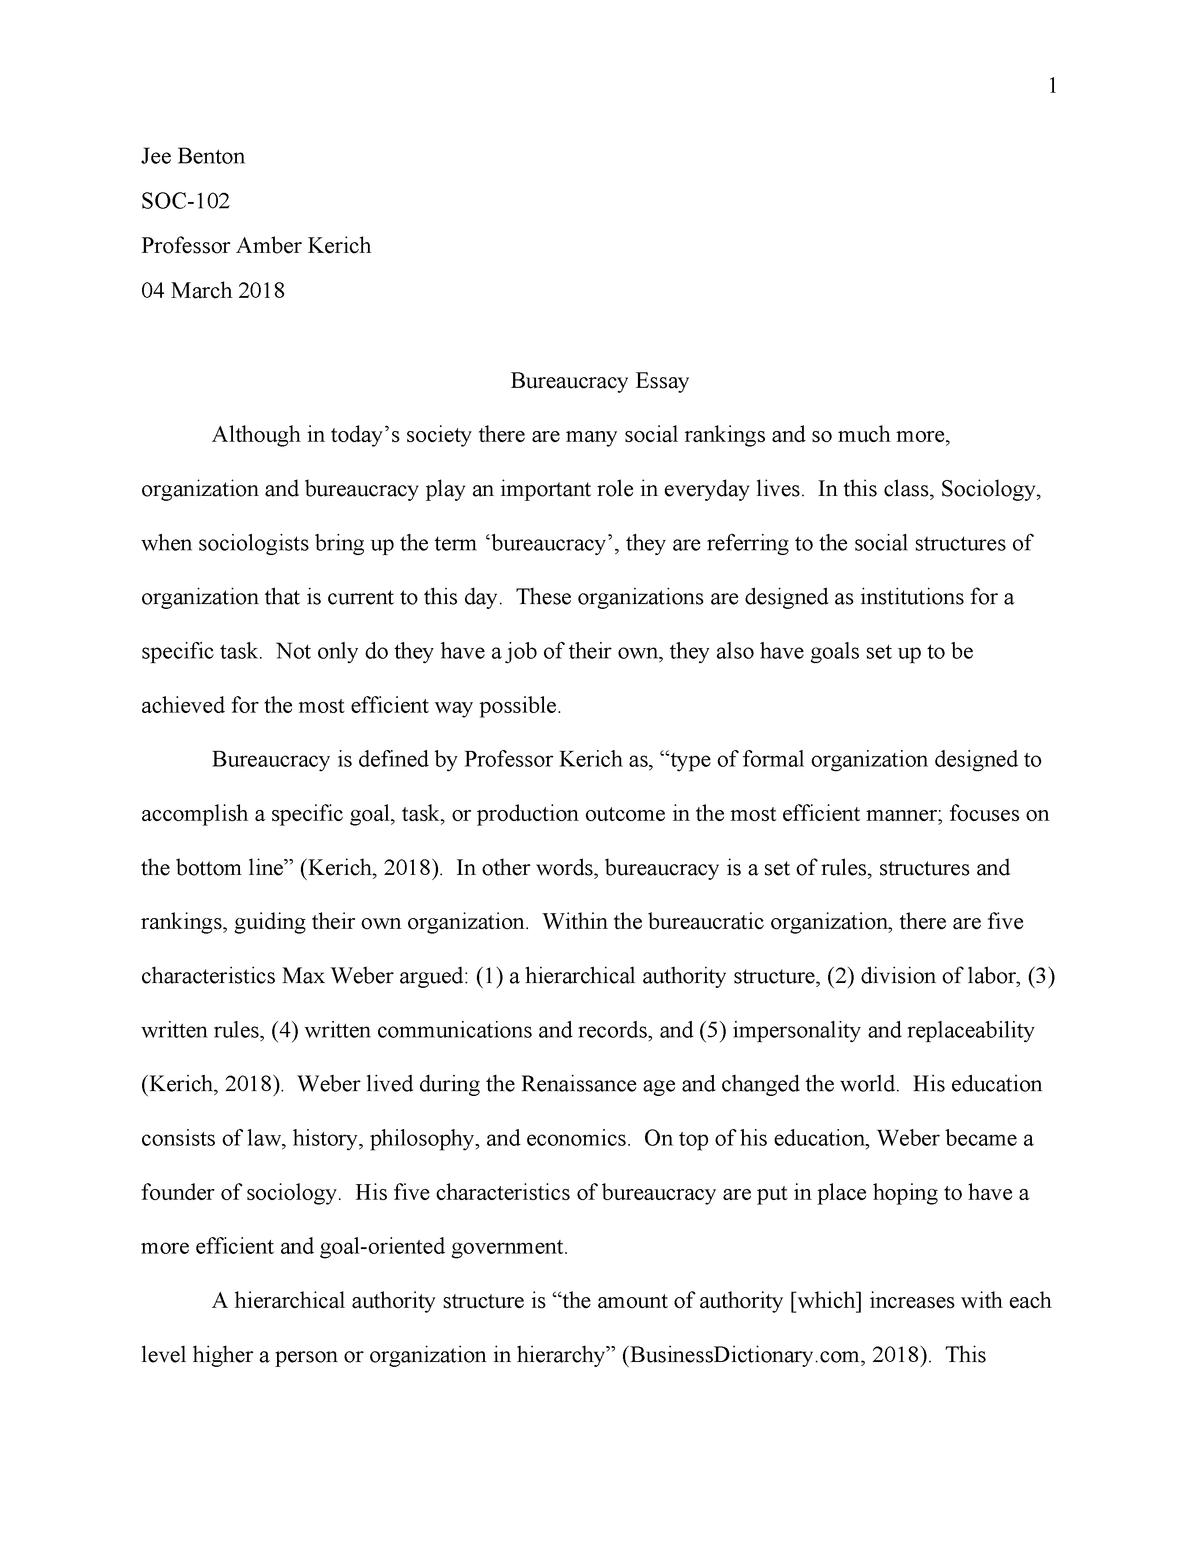 bureaucracy essay   soc    soc  principles of sociology   studocu